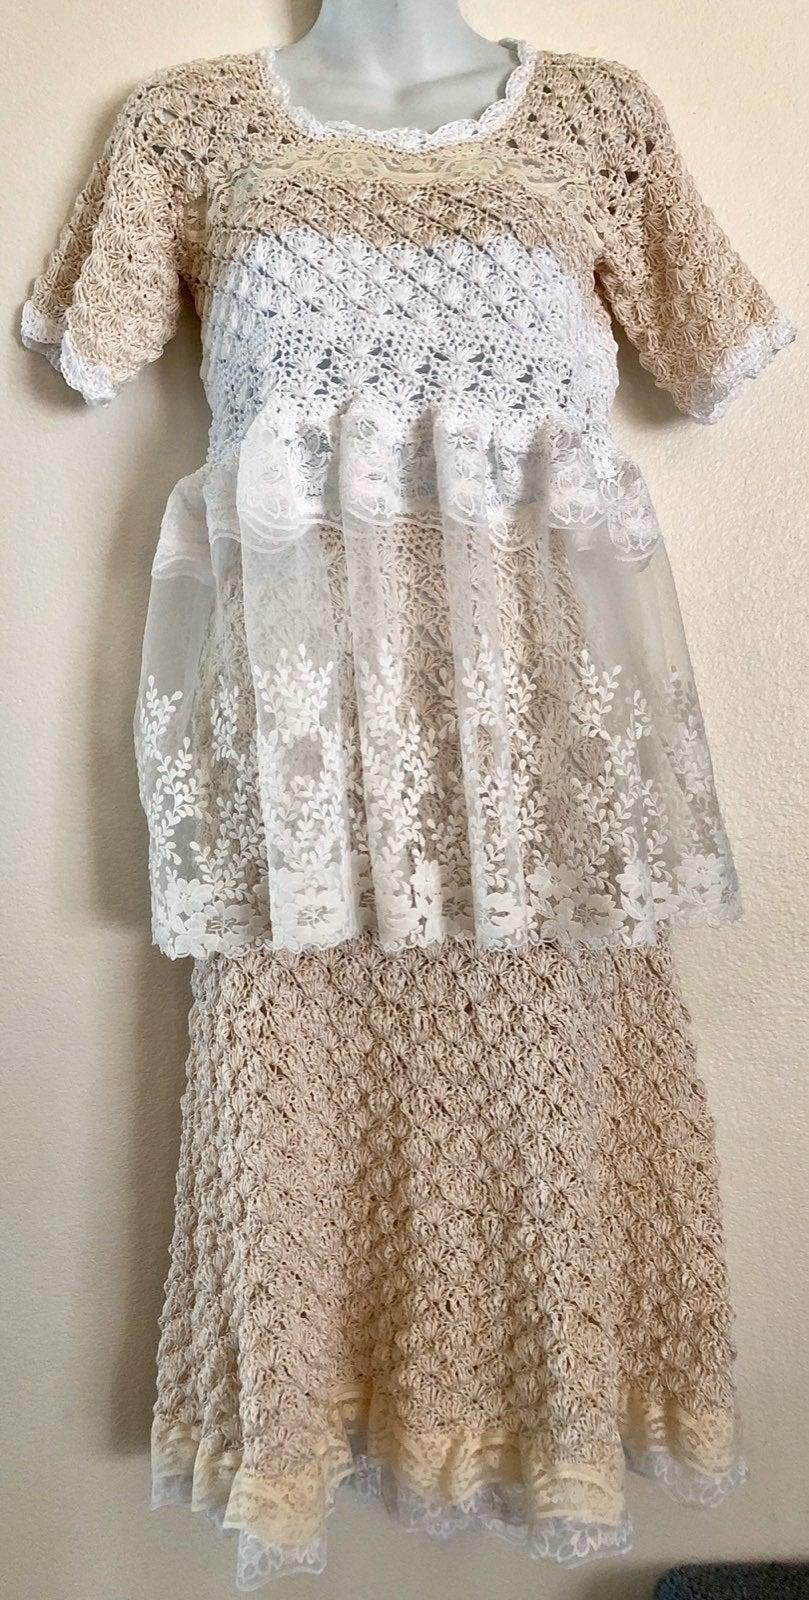 Crocheted/lace skirt top handbag set